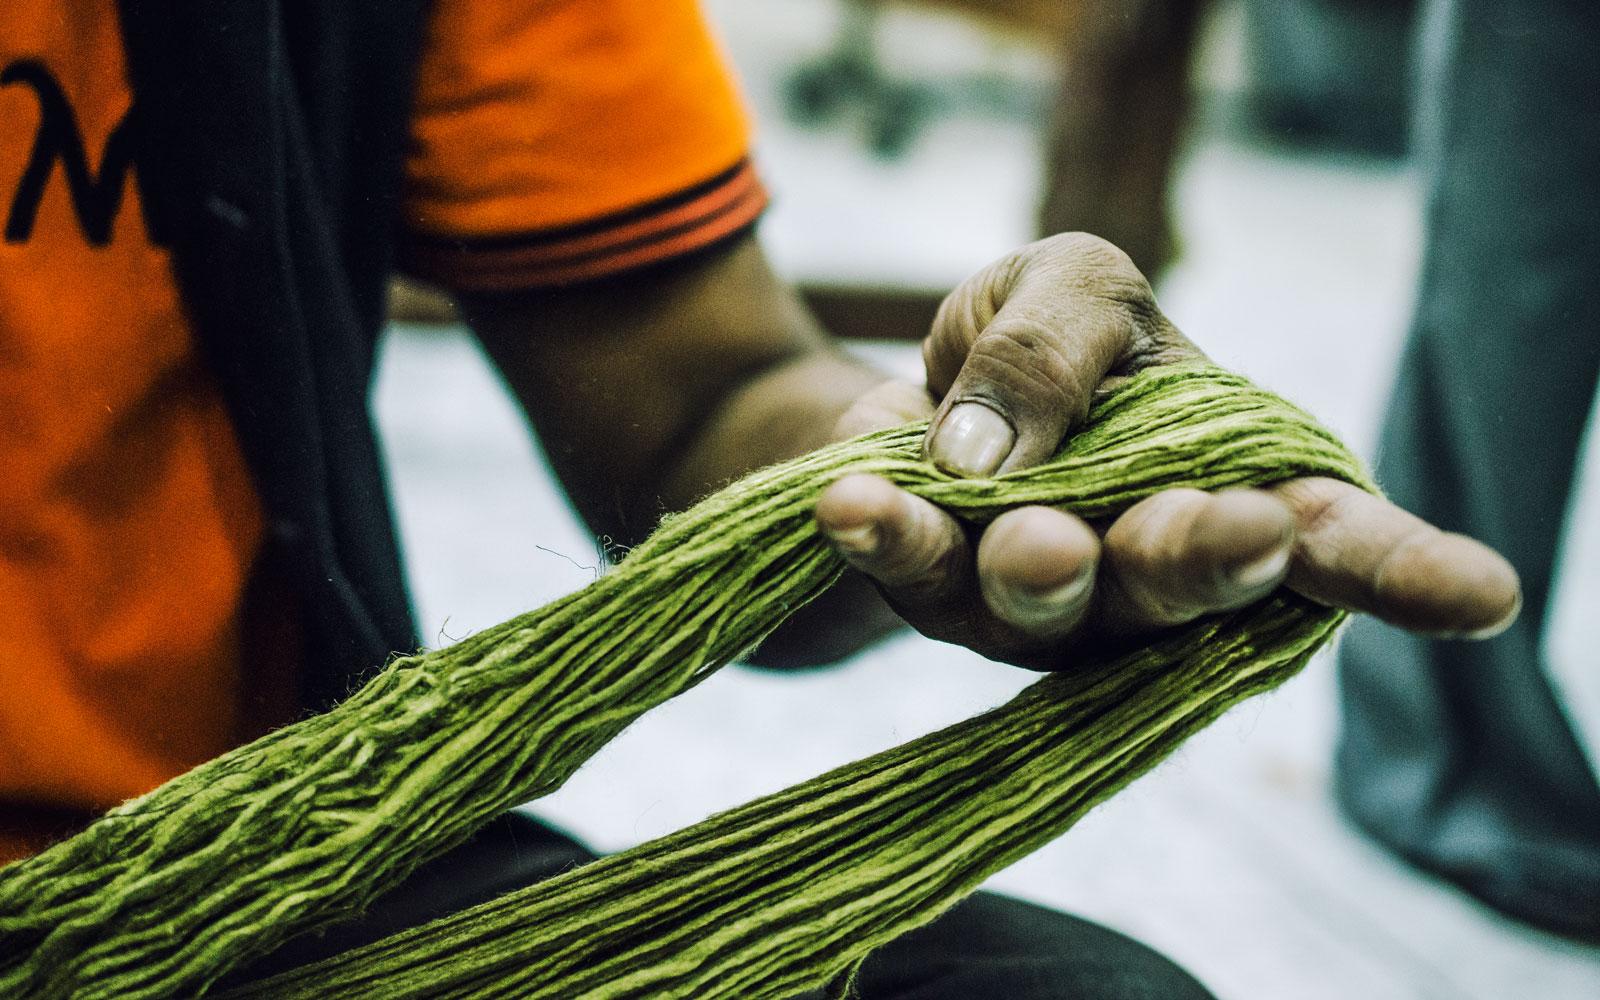 A master weaver prepares yarn at designer maker Gaurav Jai Gupta's studio.